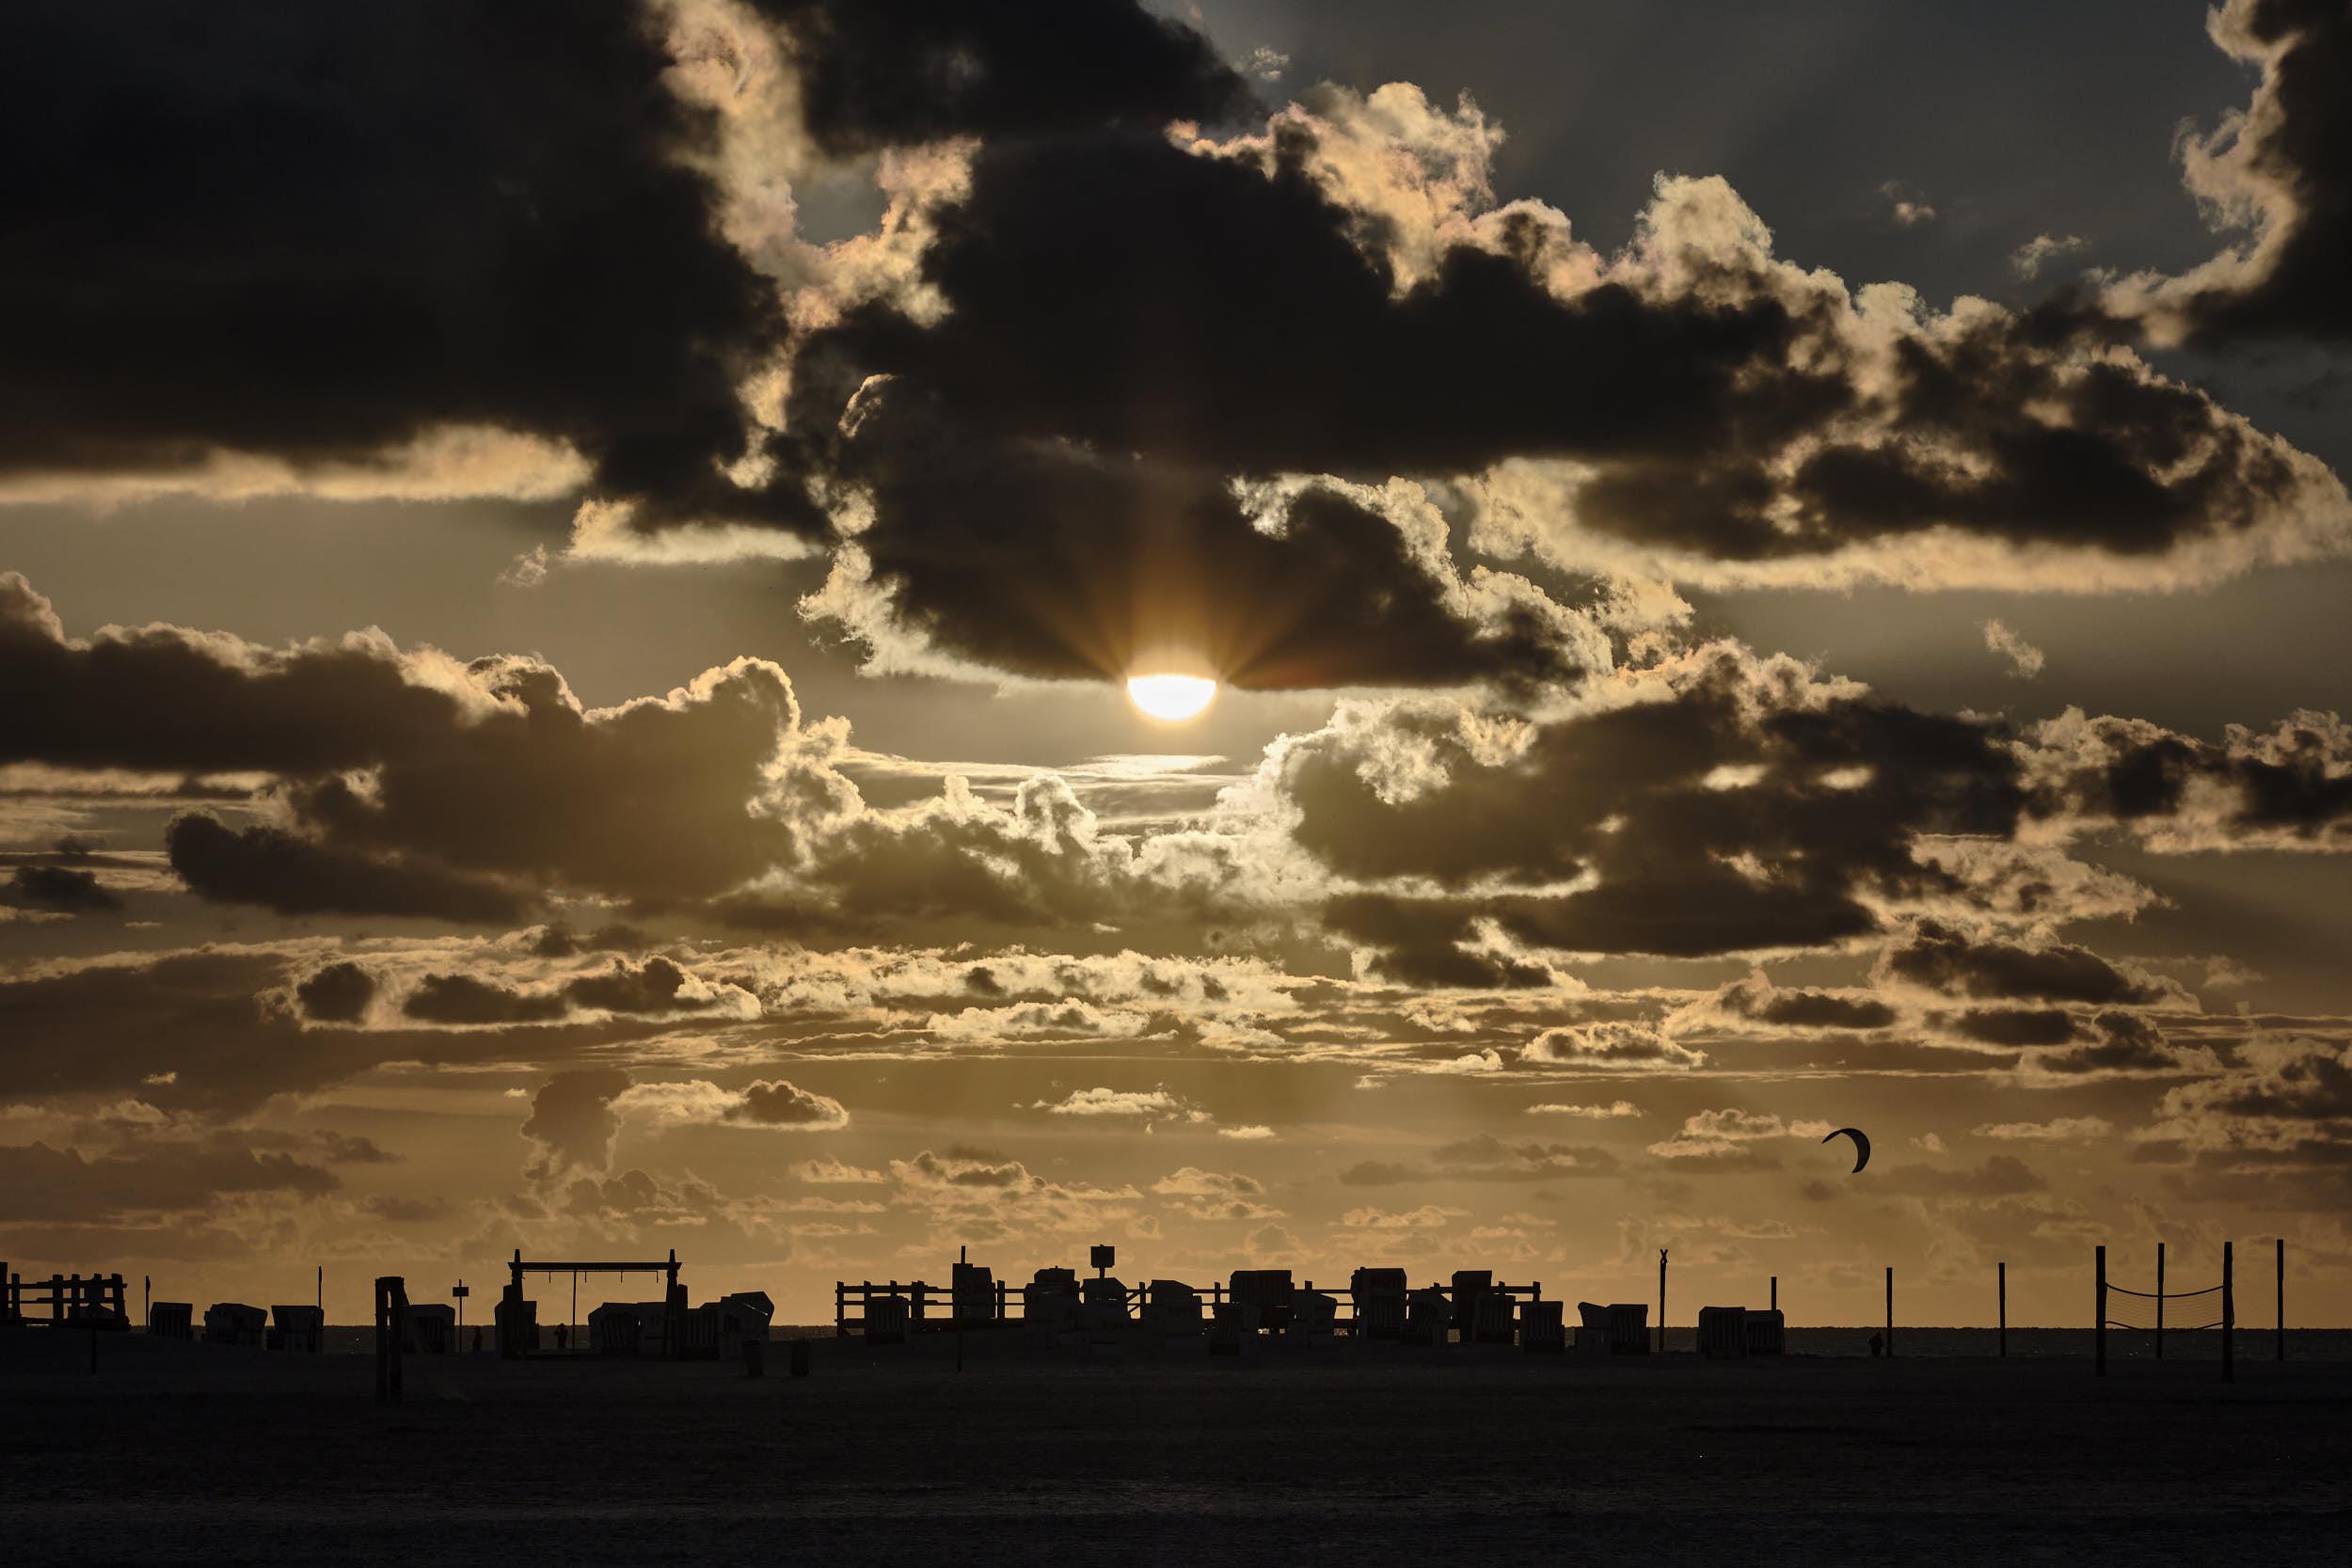 Sonnenuntergang, Silhouette Strandkörbe, Sankt-Peter-Ording